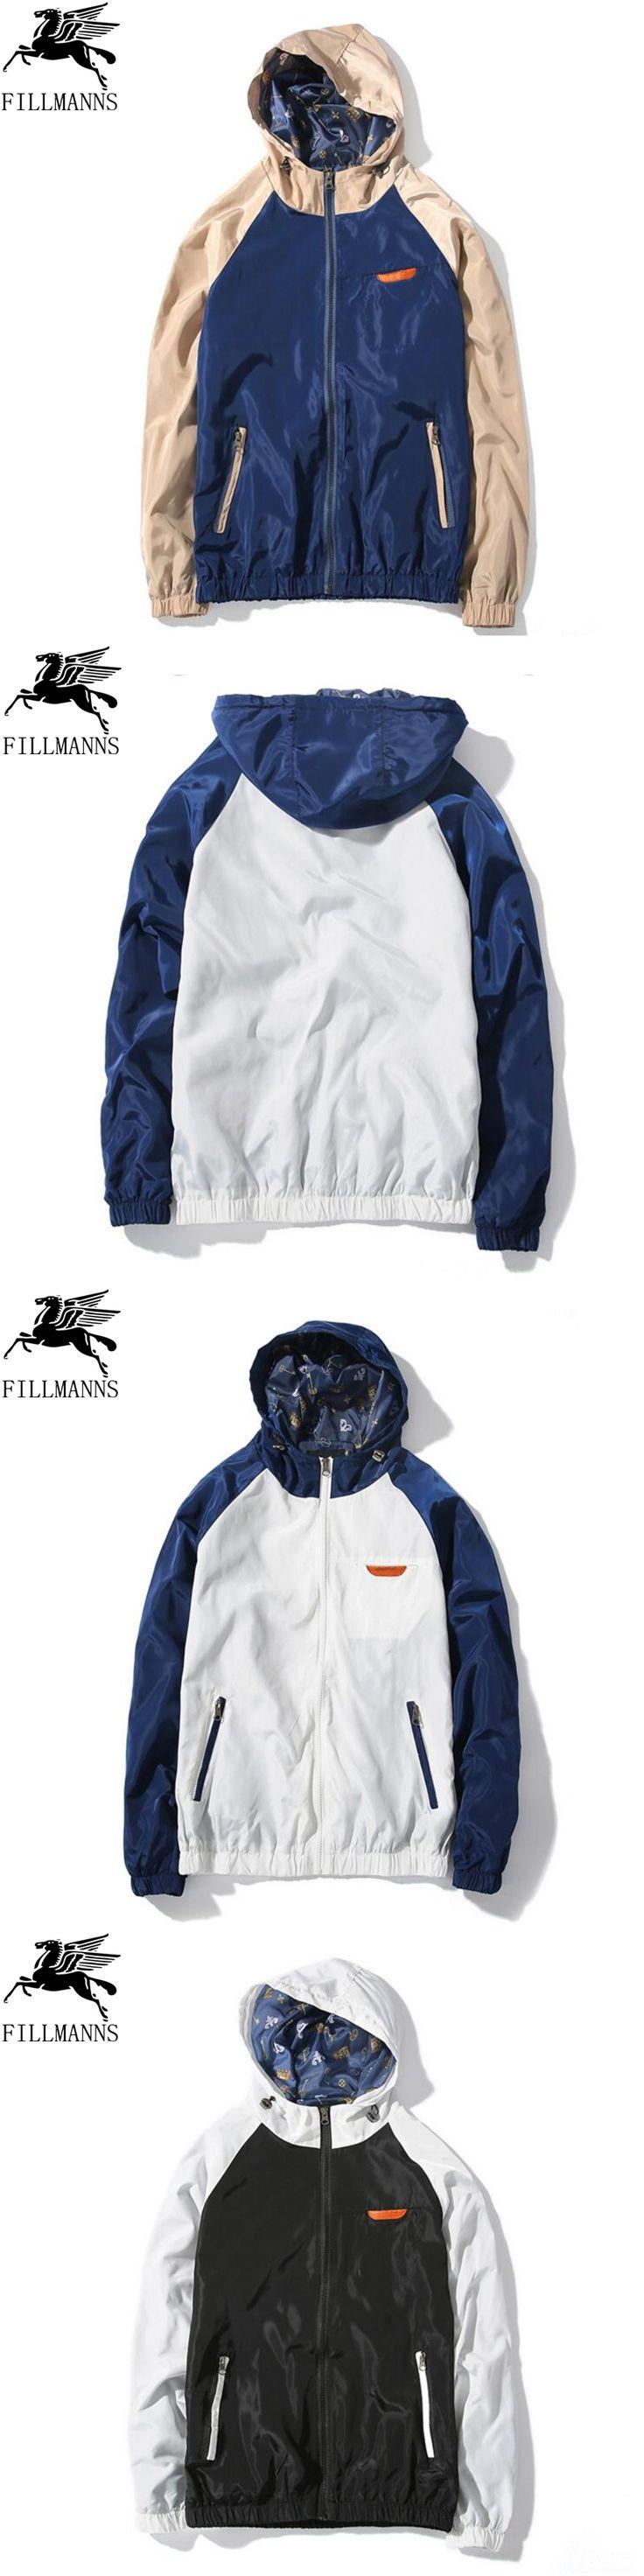 mens jackets and coats casual jacket male 2017 Autumn Hoodie Jacket Men Waterproof Clothes Men's Windbreaker Coat Male Outwear